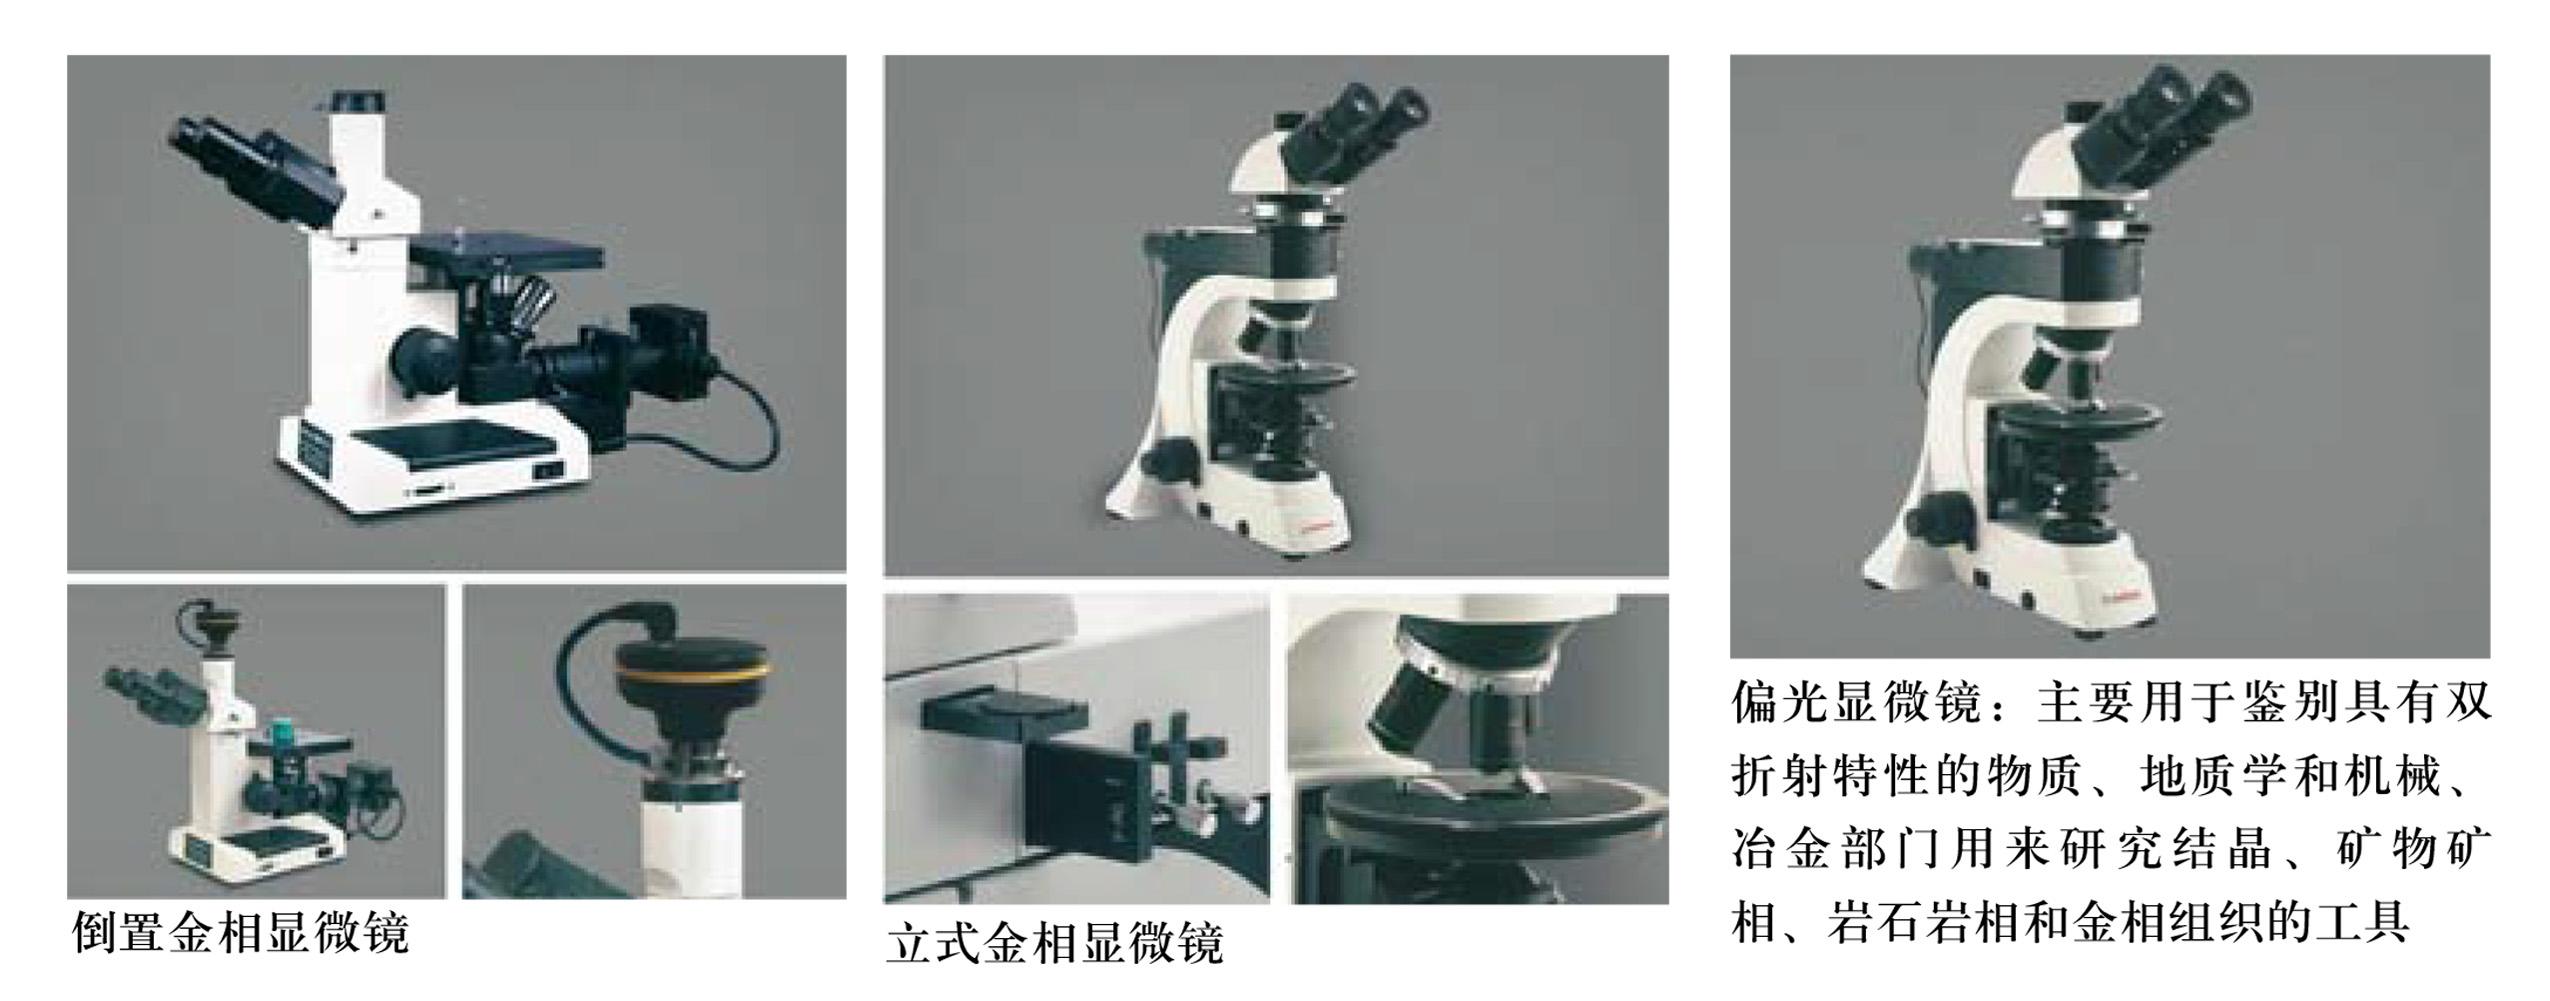 <strong>METKON 金相显微镜和图像分析系统</strong>